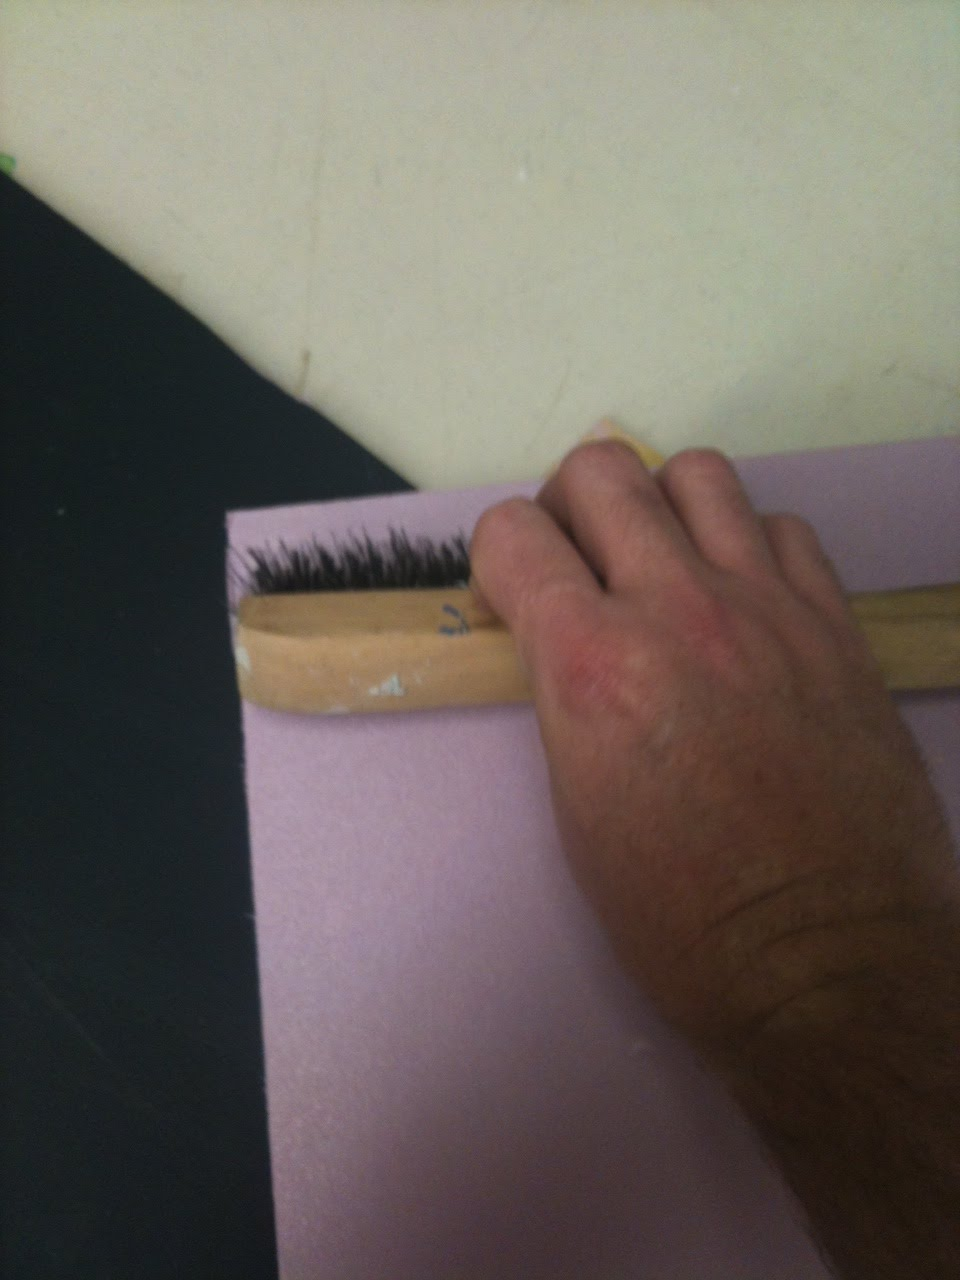 Creative construction how to make styrofoam look like wood